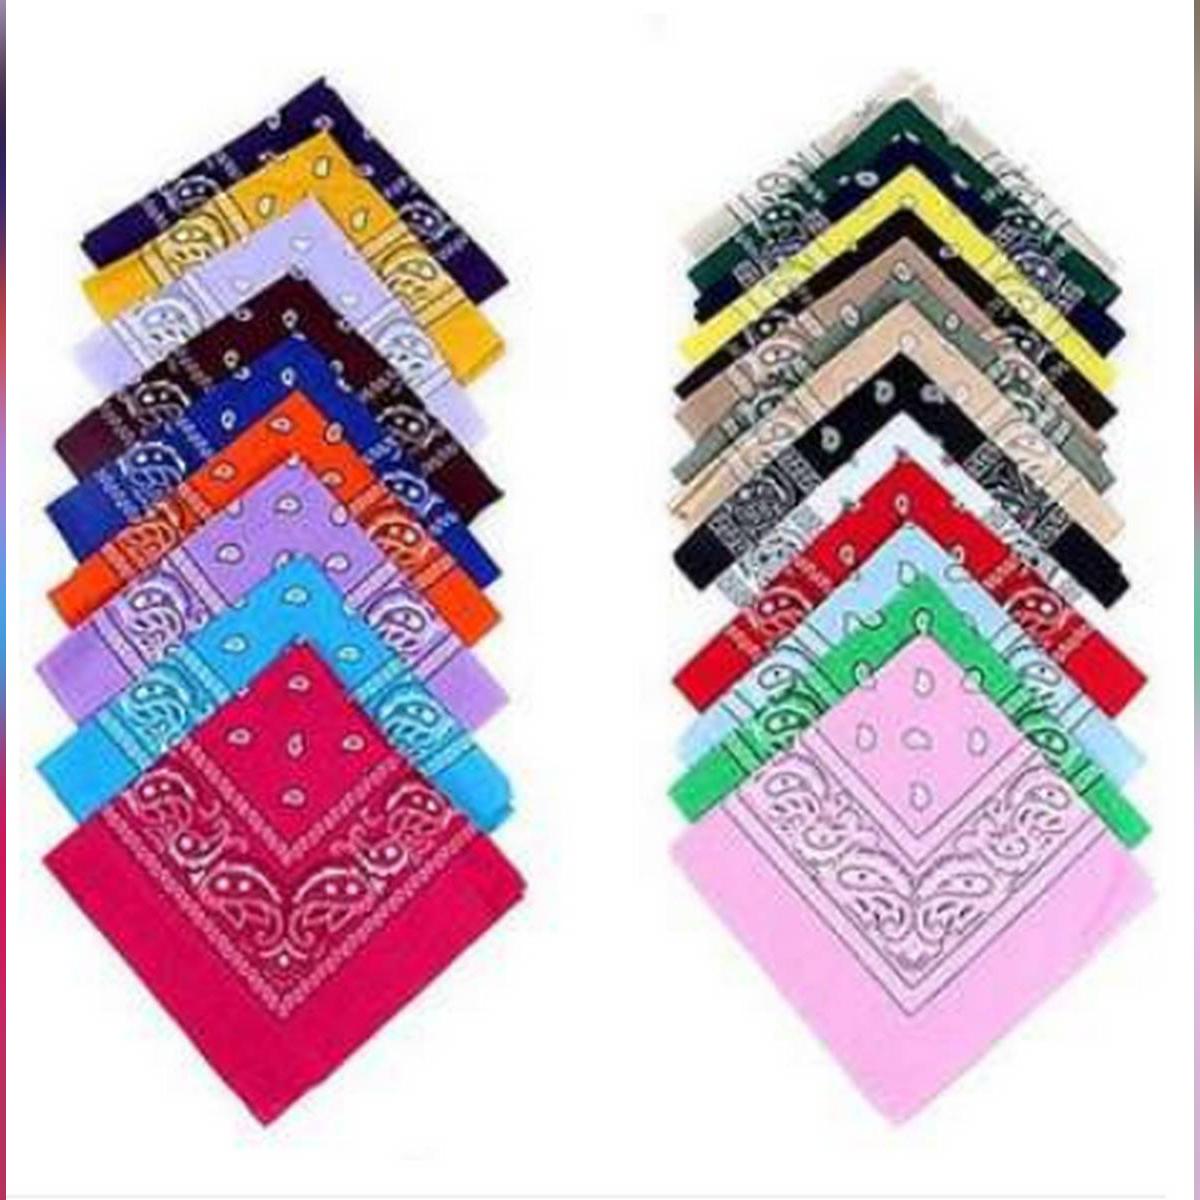 Cool Cotton Lady Men Square Bandana Hiphop Head Wrap Scarf Wristband(Size:21.65 inch x 21.65 inch)